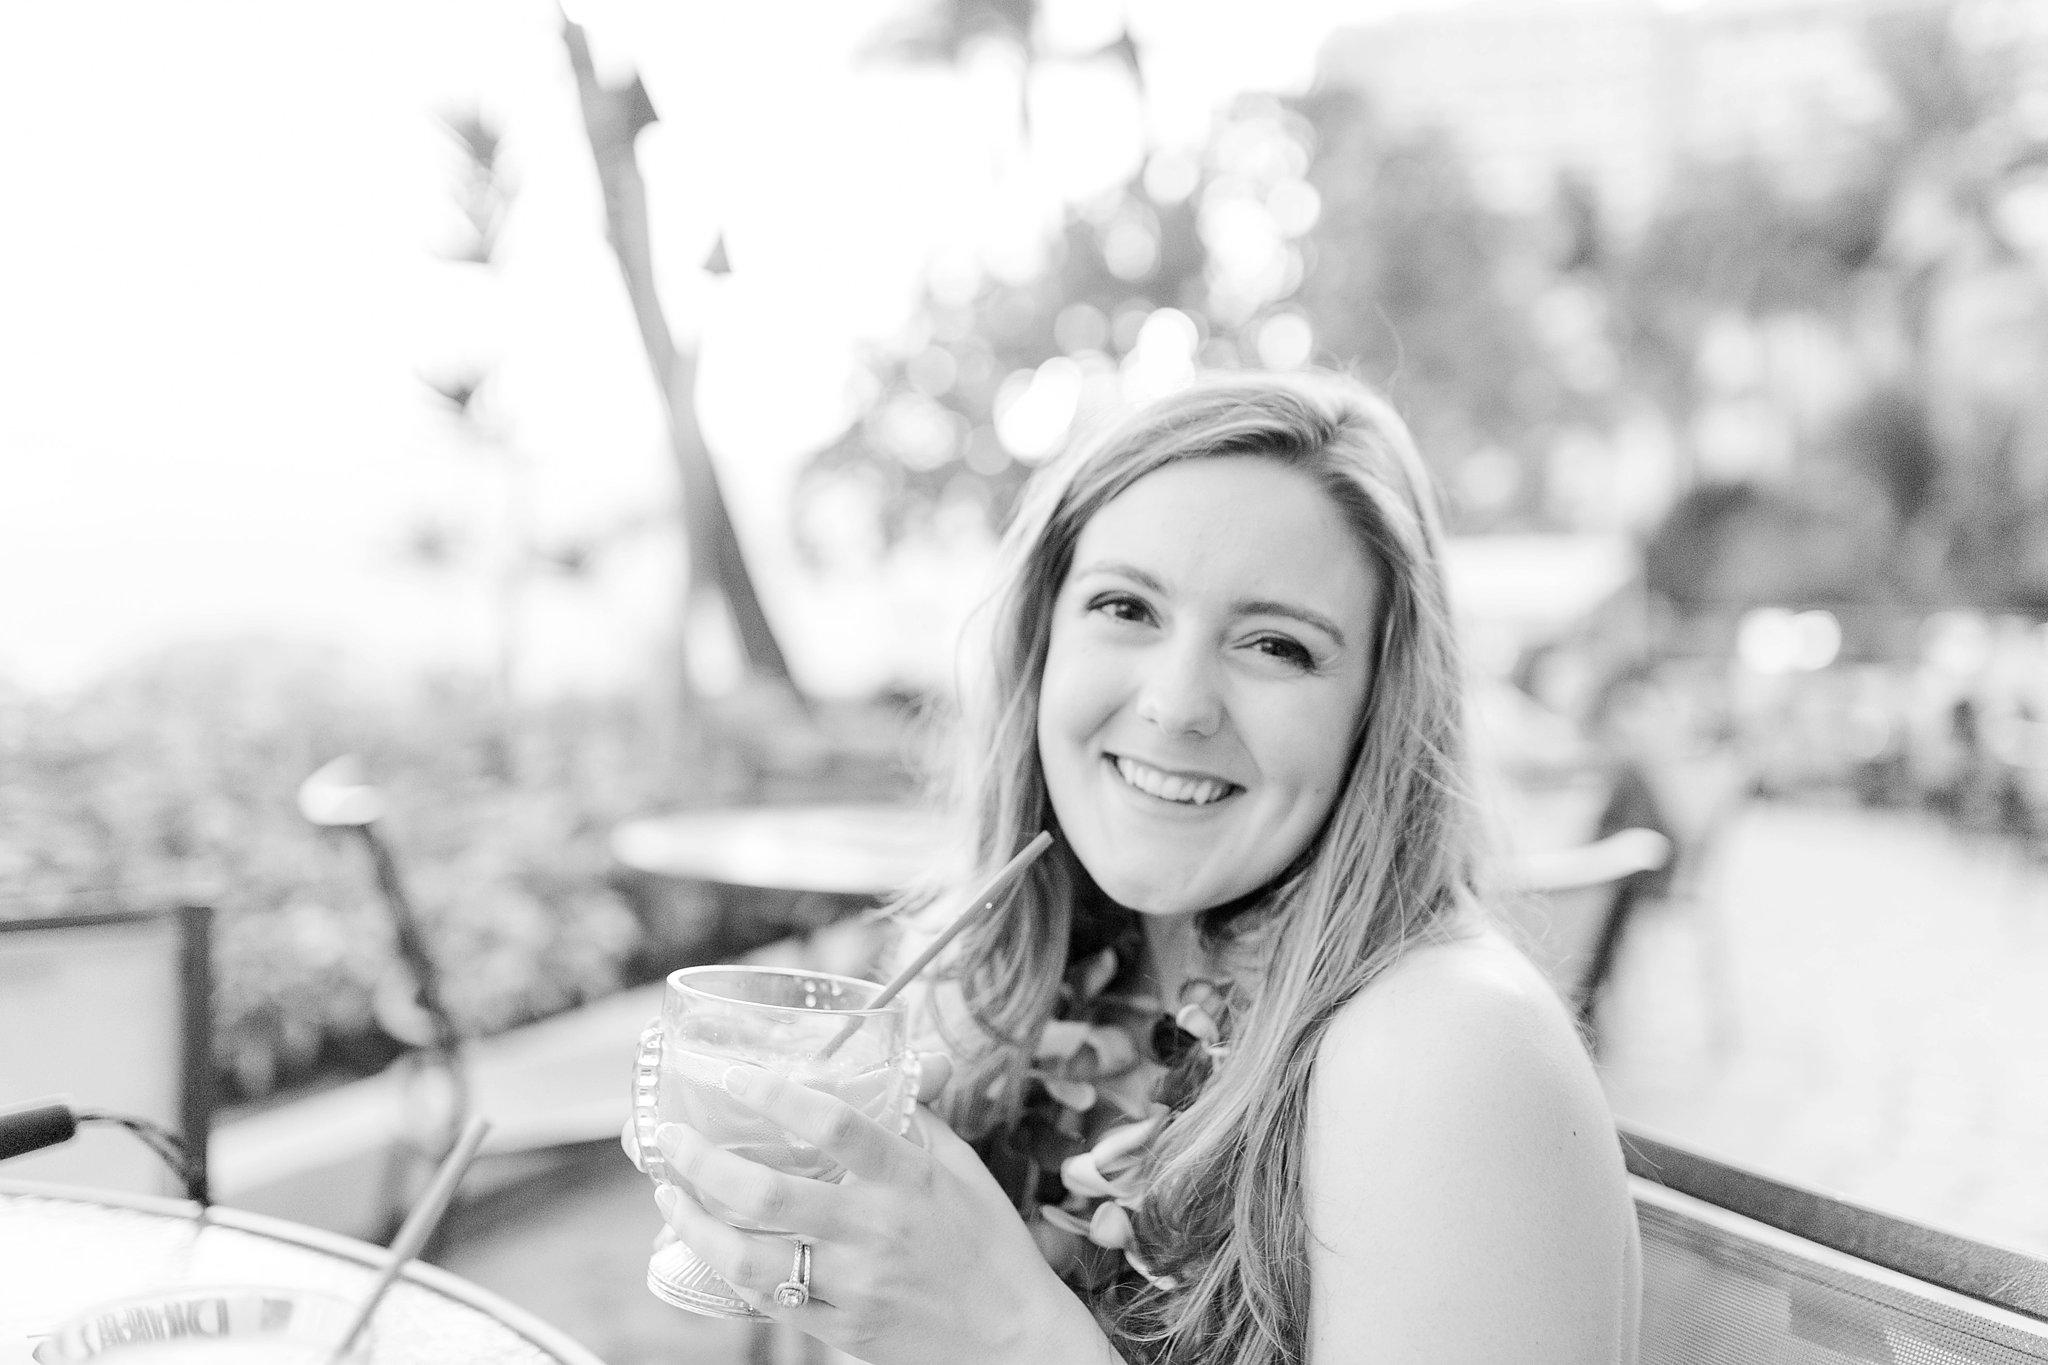 Hawaii Honeymoon Photos Megan & Justin Oahu Vacation Things To Do--26.jpg